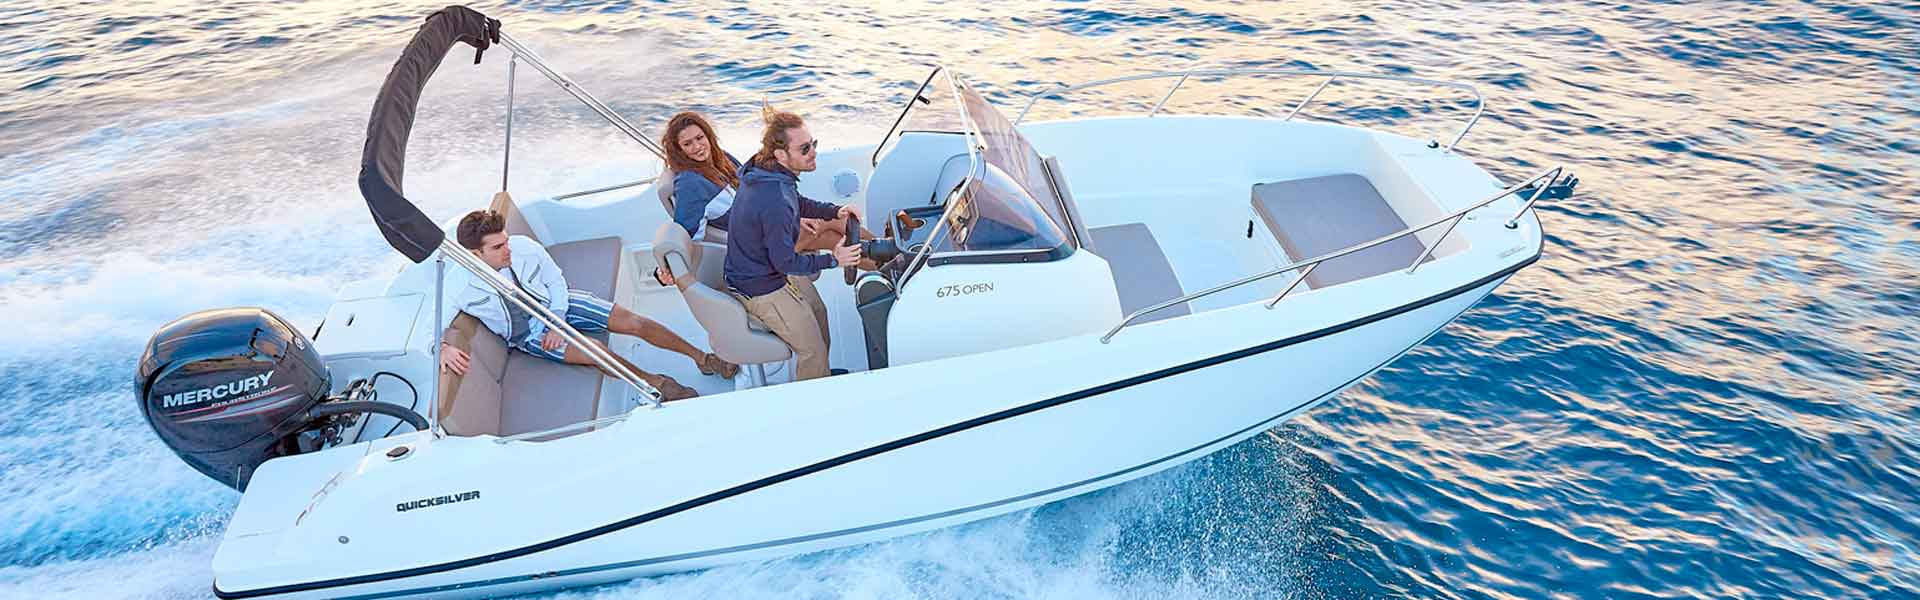 quicksilver yacht dubrovnik